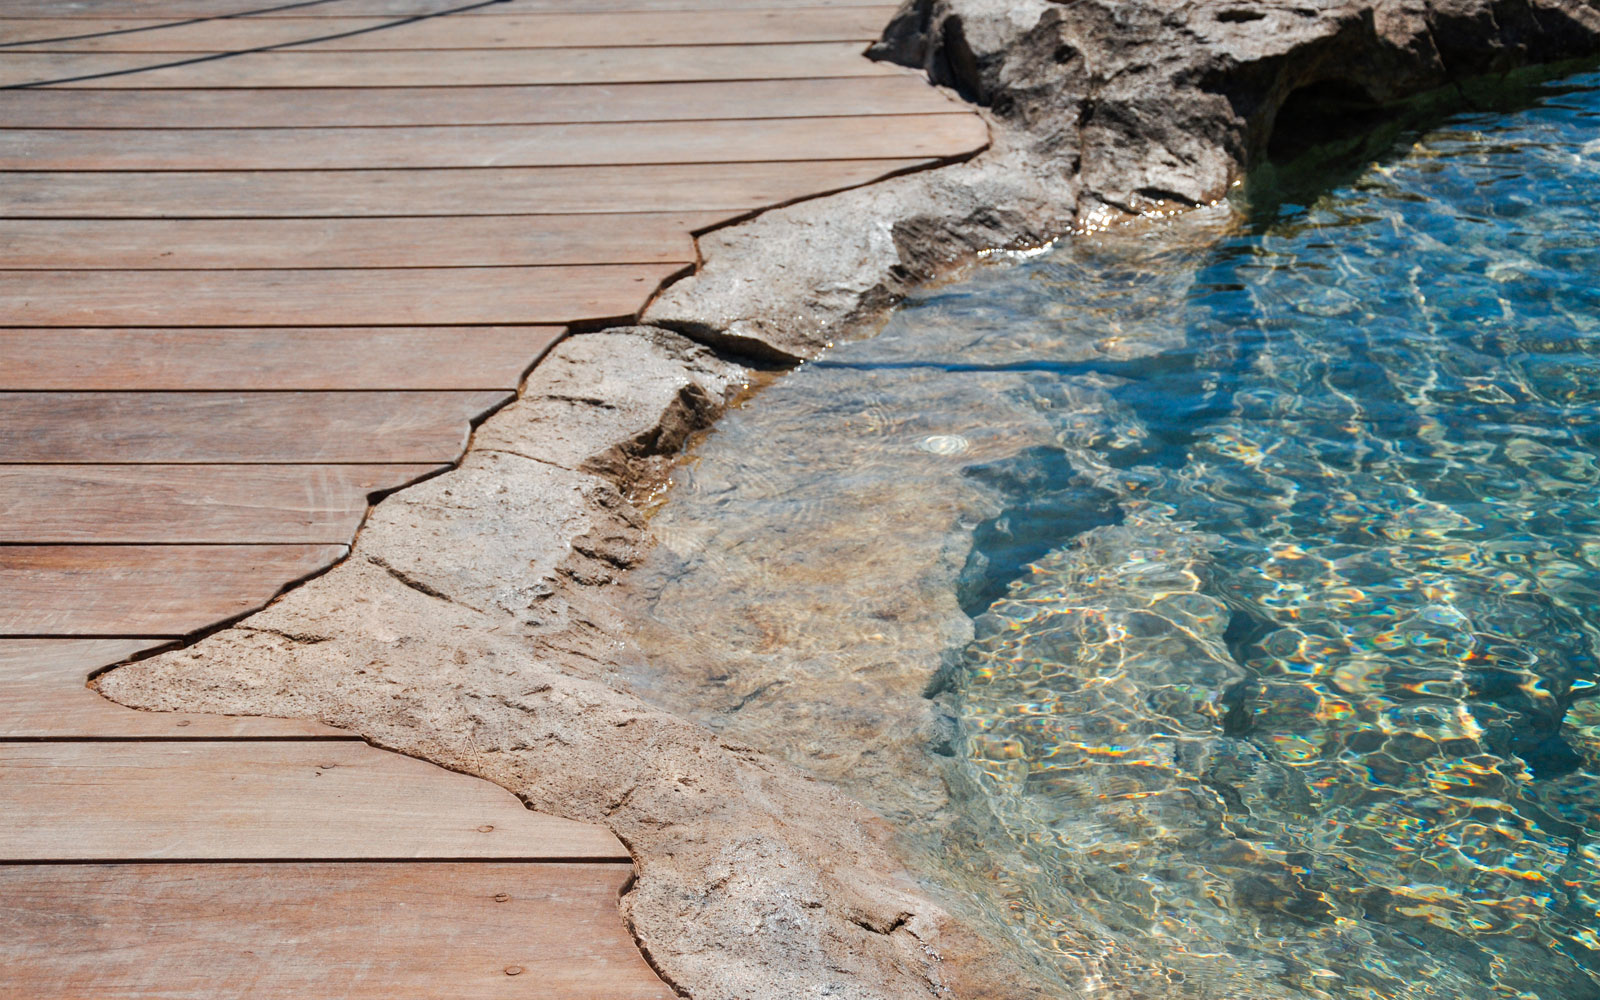 Bassin de baignade ou bassin poissons paysag for Piscine miroir debit